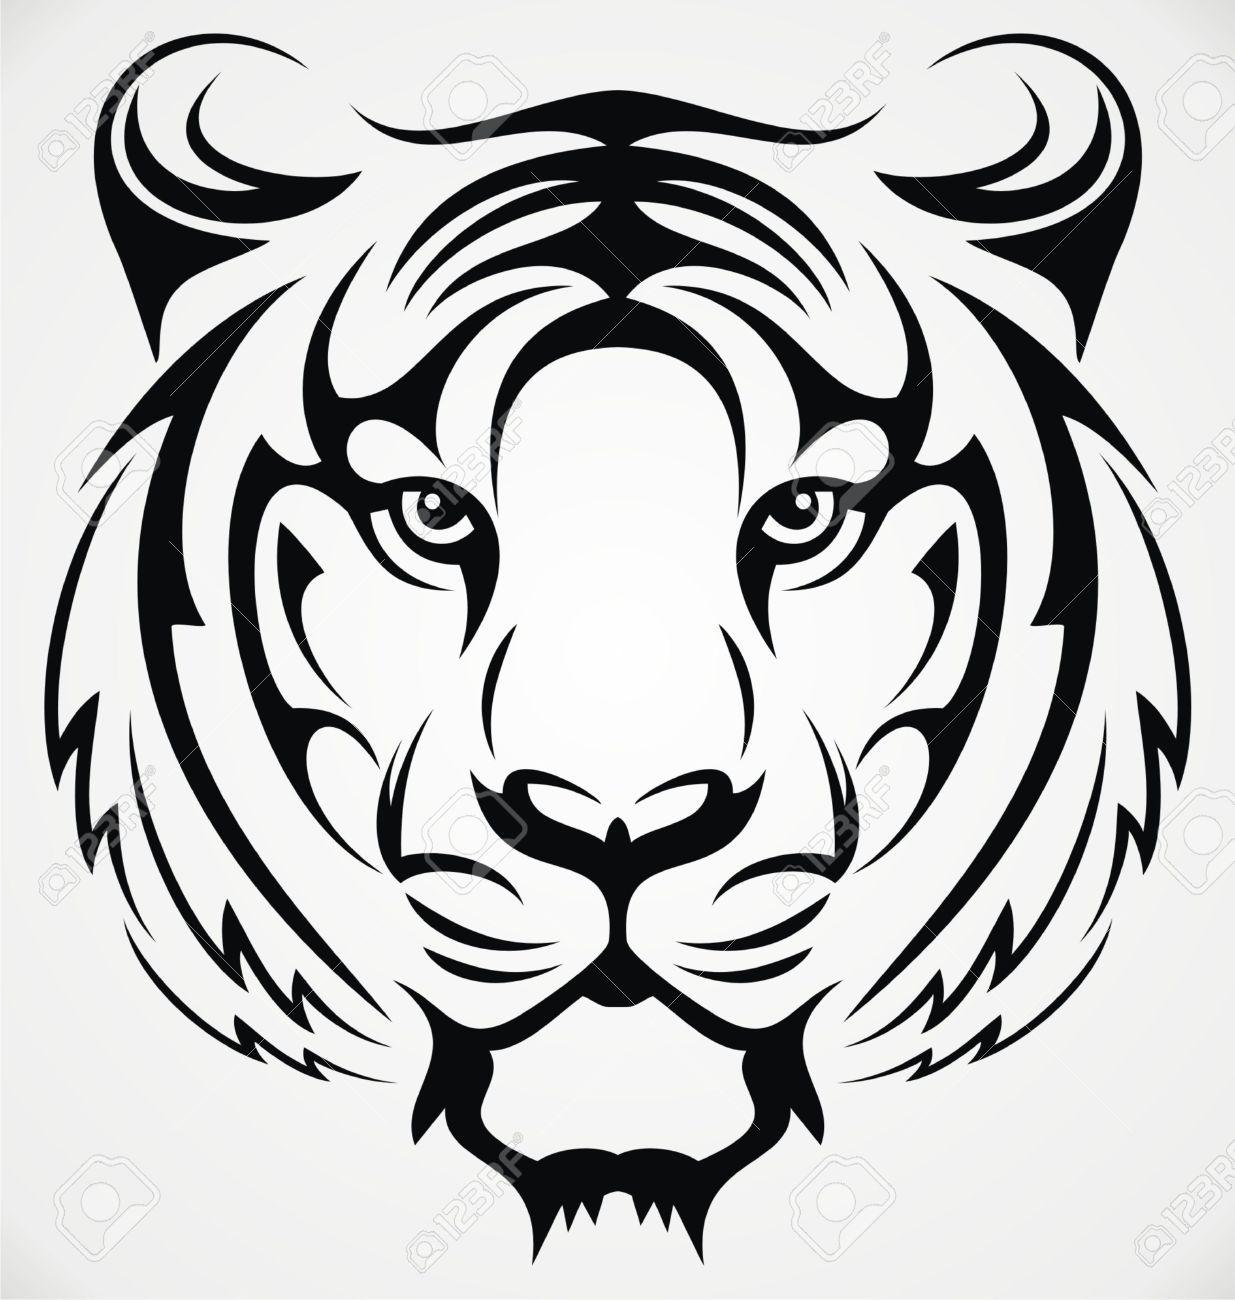 Kartinki Po Zaprosu Tribal Tiger Tattoo Tiger Face Drawing Tribal Tiger Animal Stencil